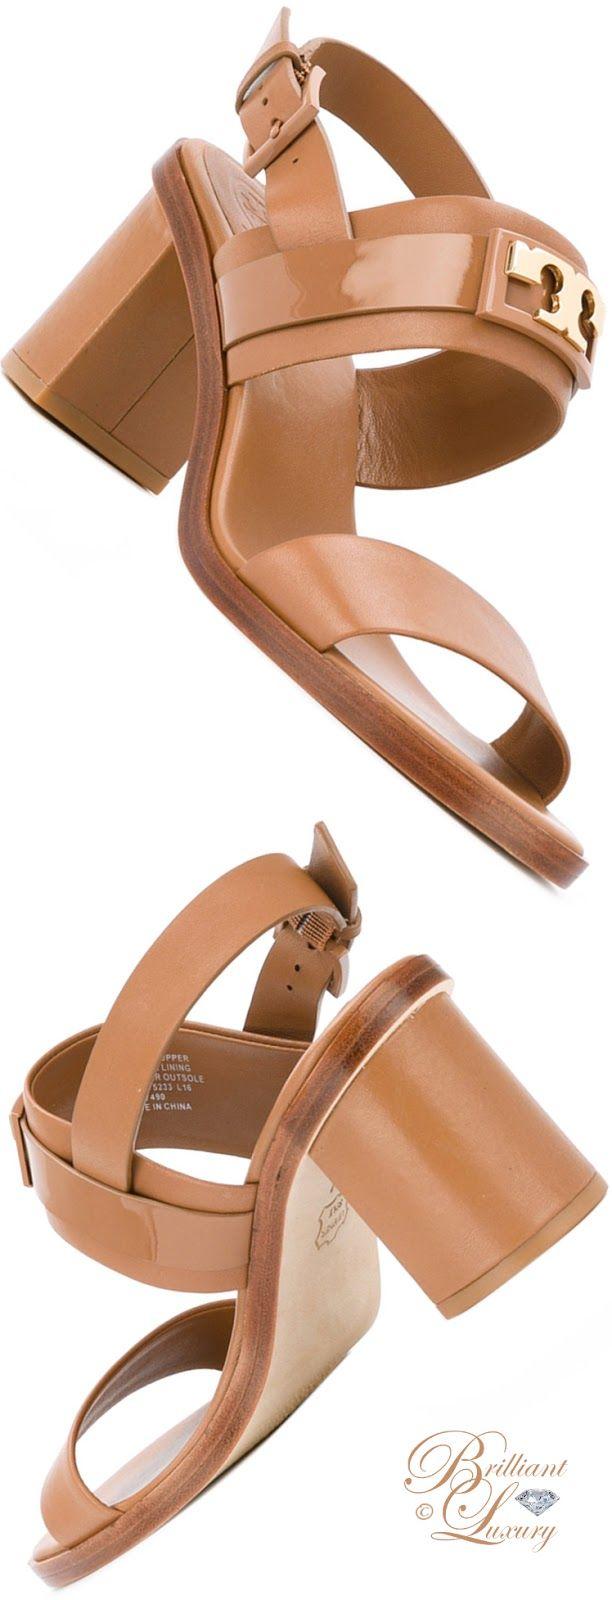 Brilliant Luxury by Emmy DE ♦ Tory Burch Chunky Heel Sandals